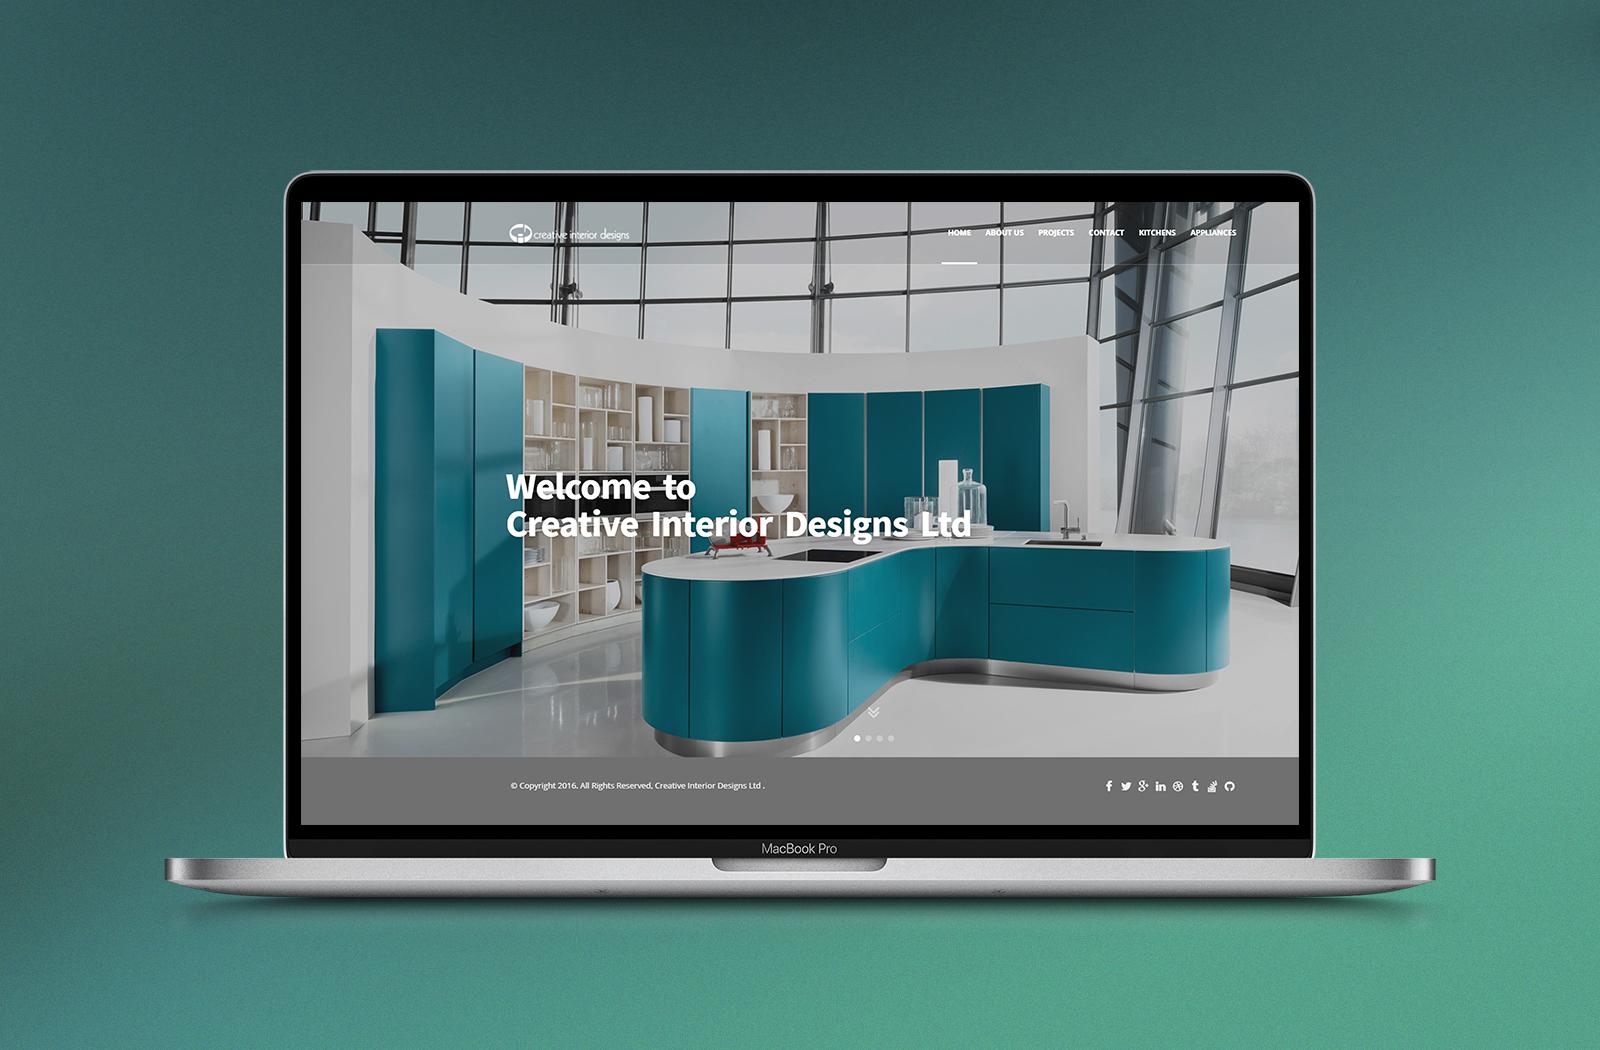 http://newform.media/wp-content/uploads/2020/03/kitchen-renovat01.jpg